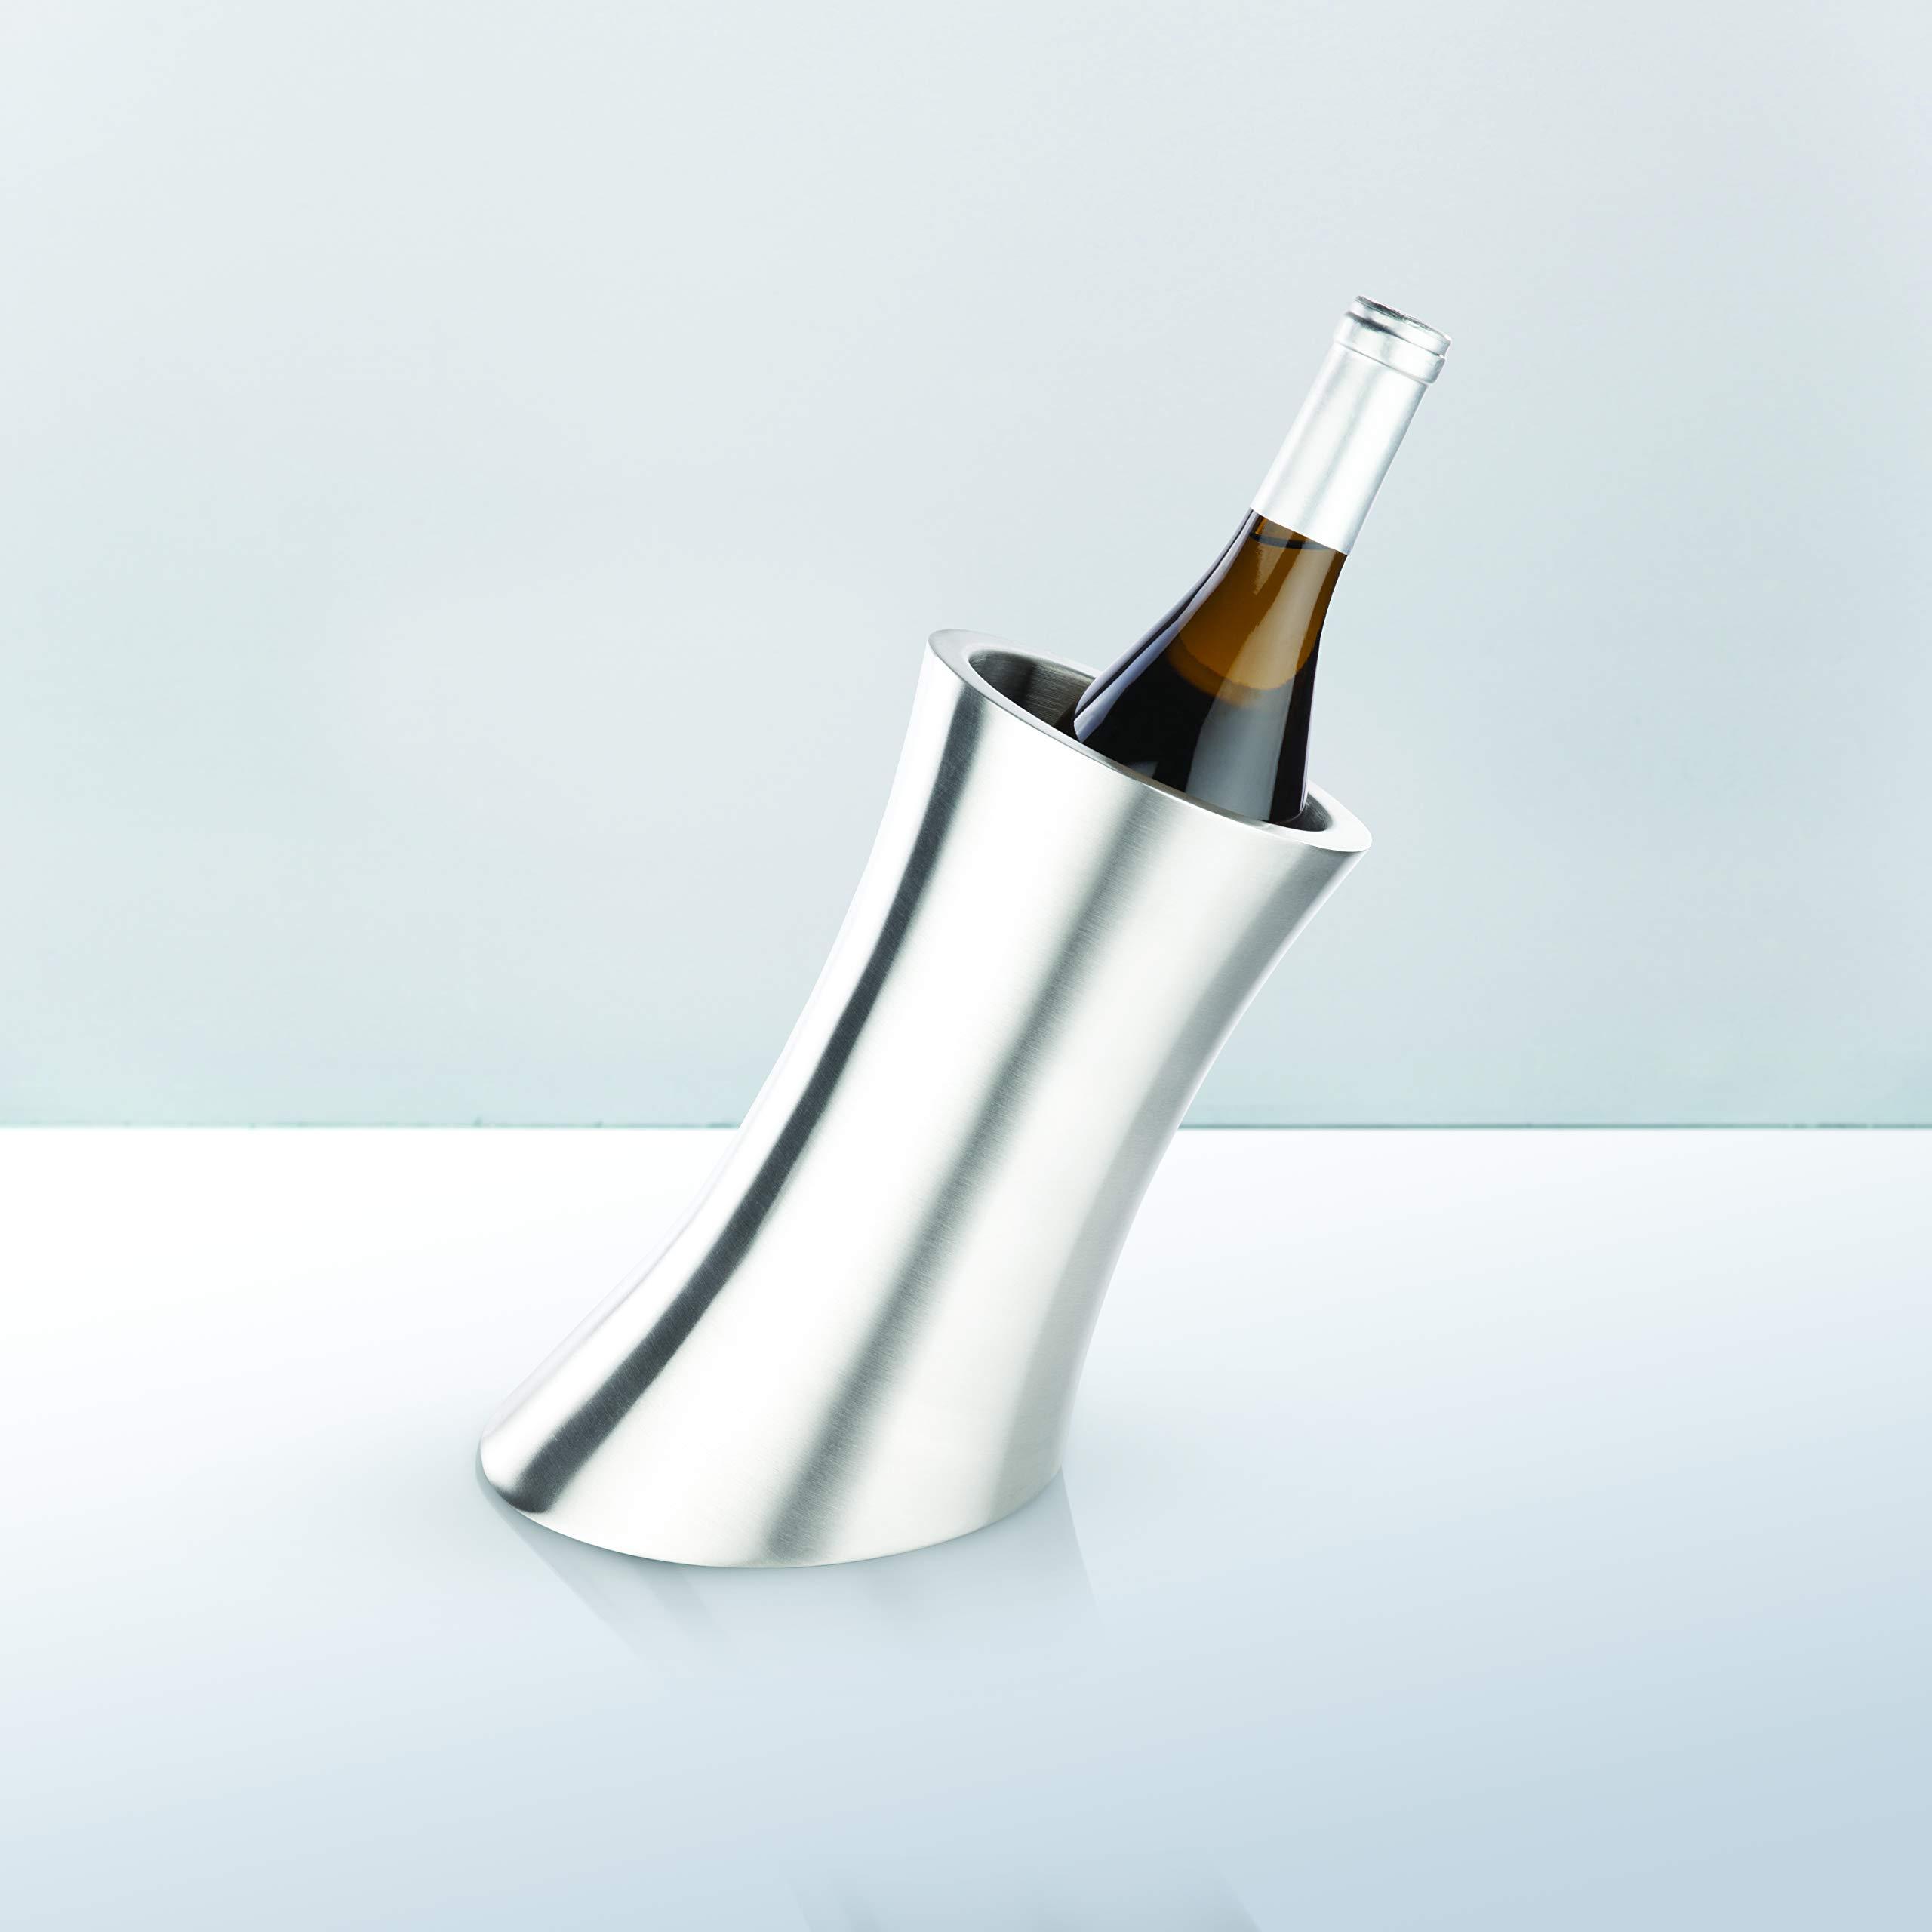 Harrison Convex Stainless Steel Insulated Wine Bottle Chiller by Viski by Viski